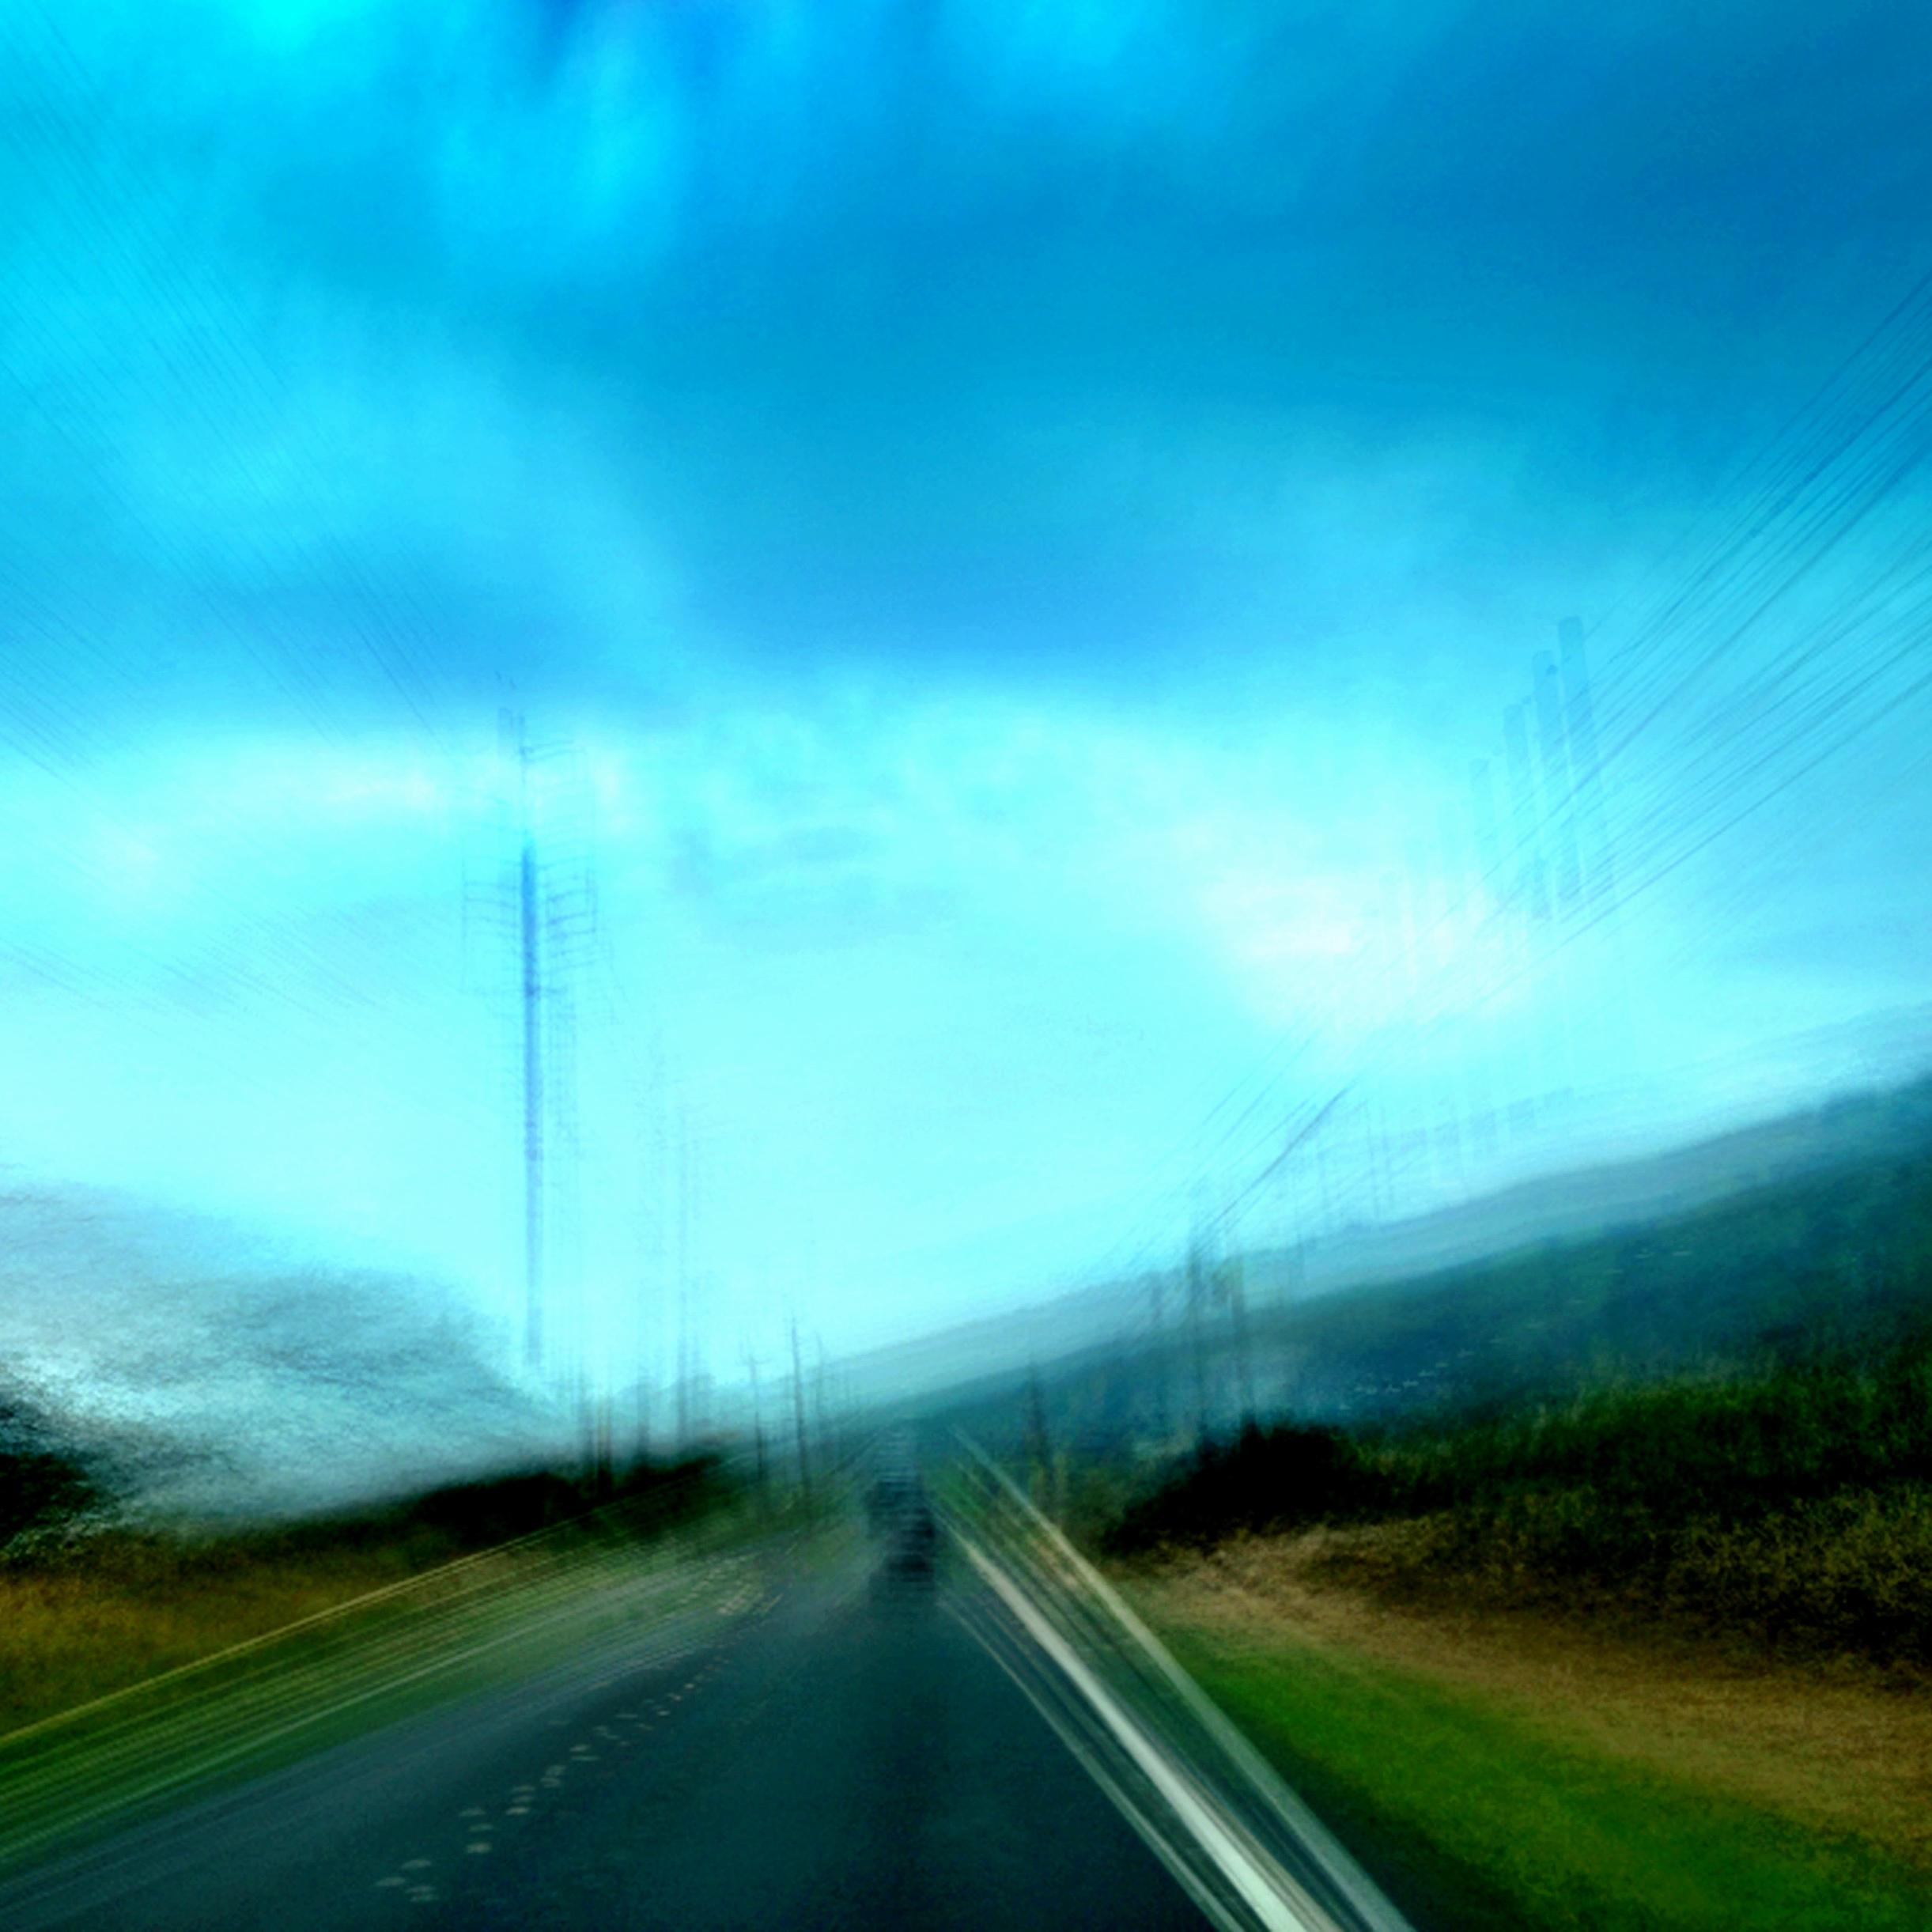 wpid-img_3686-2012-12-2-21-59.jpg